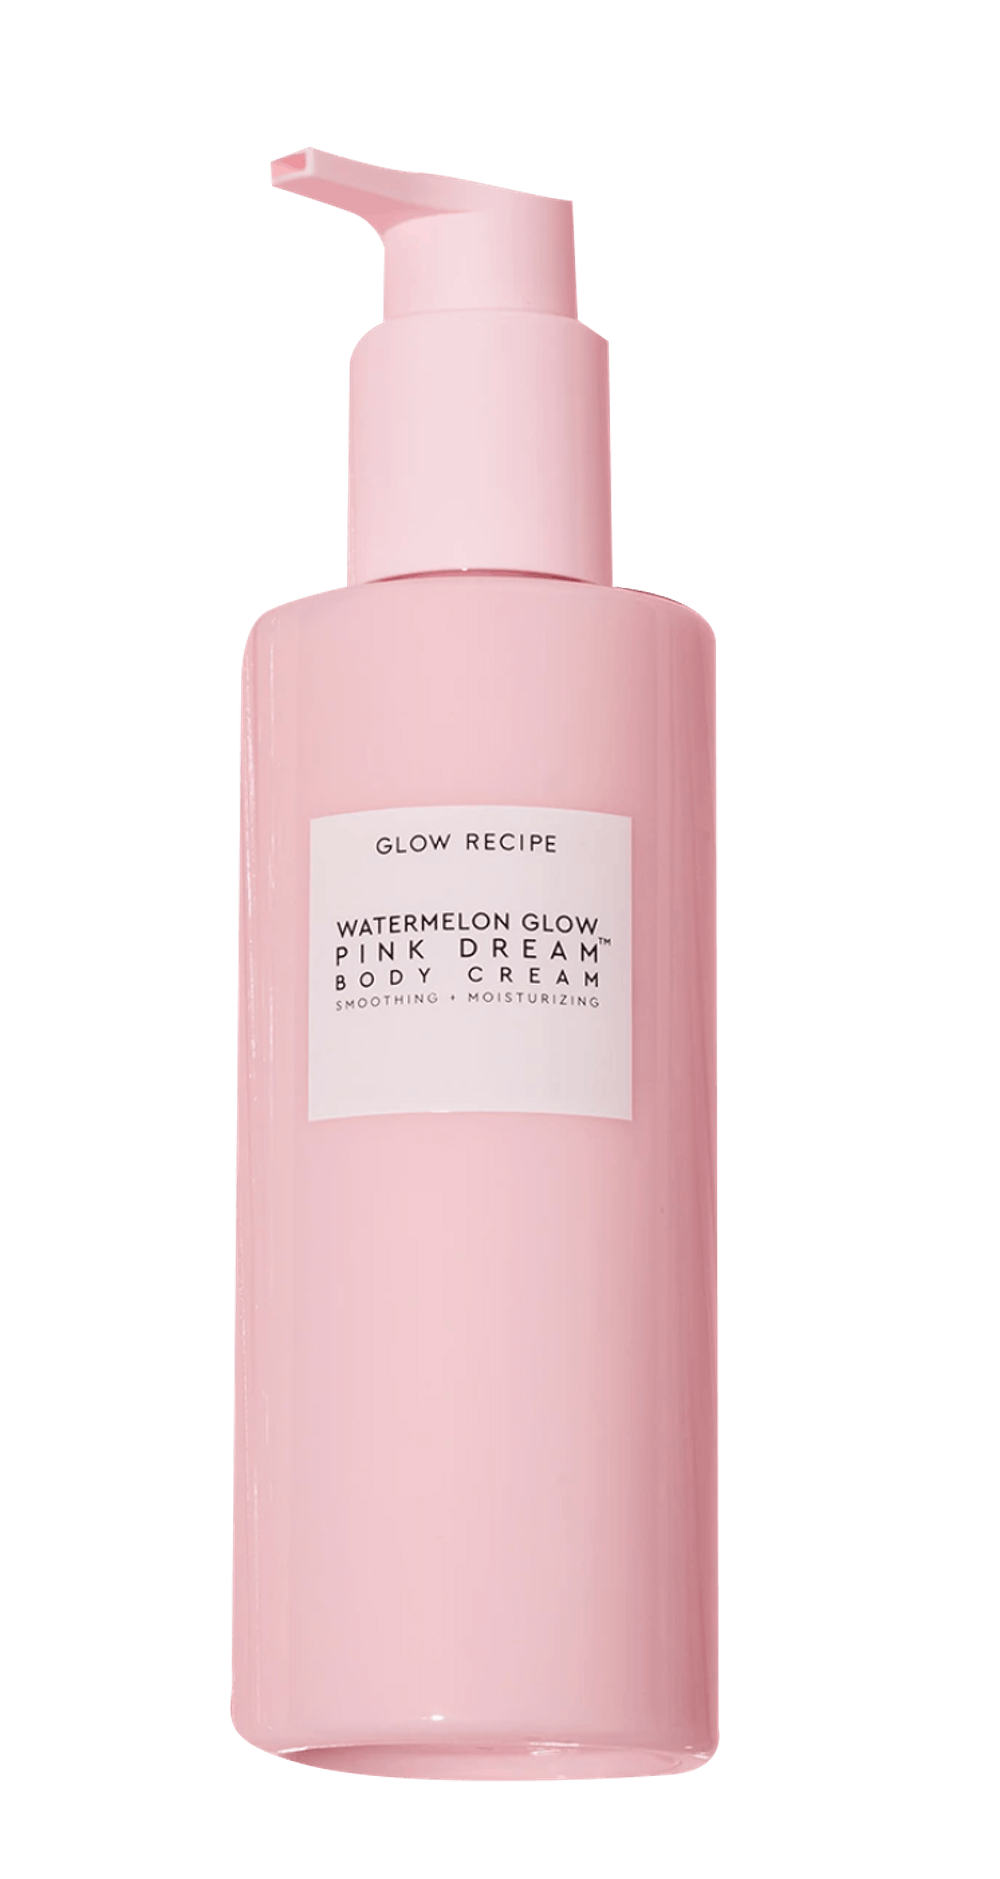 Watermelon Glow Pink Dream Body Cream